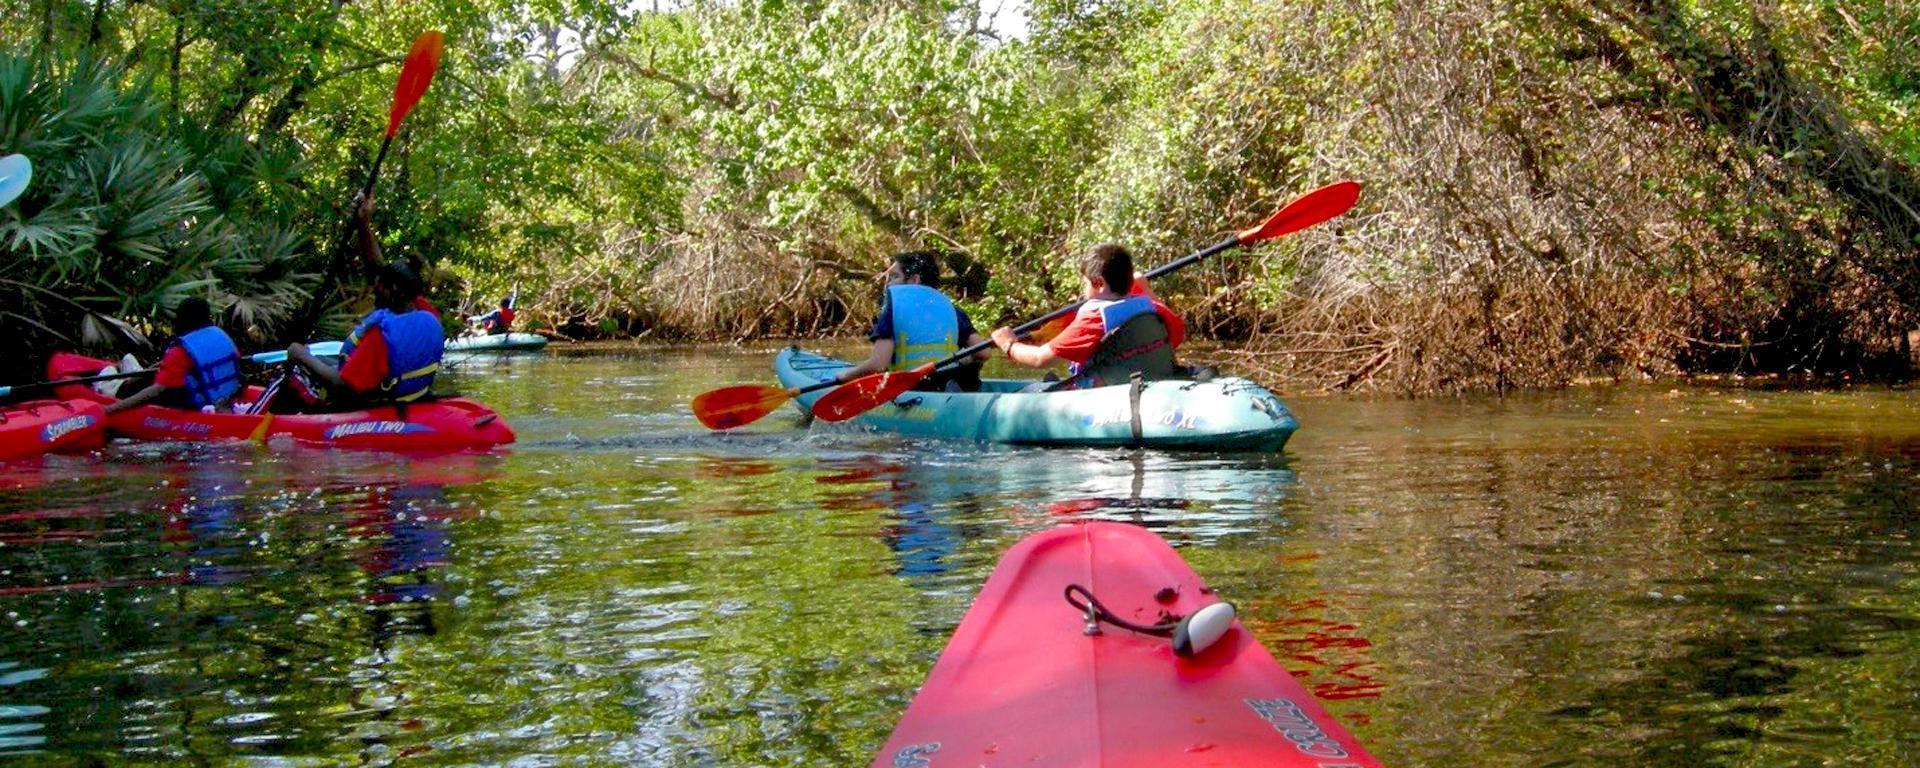 People in a Kayak